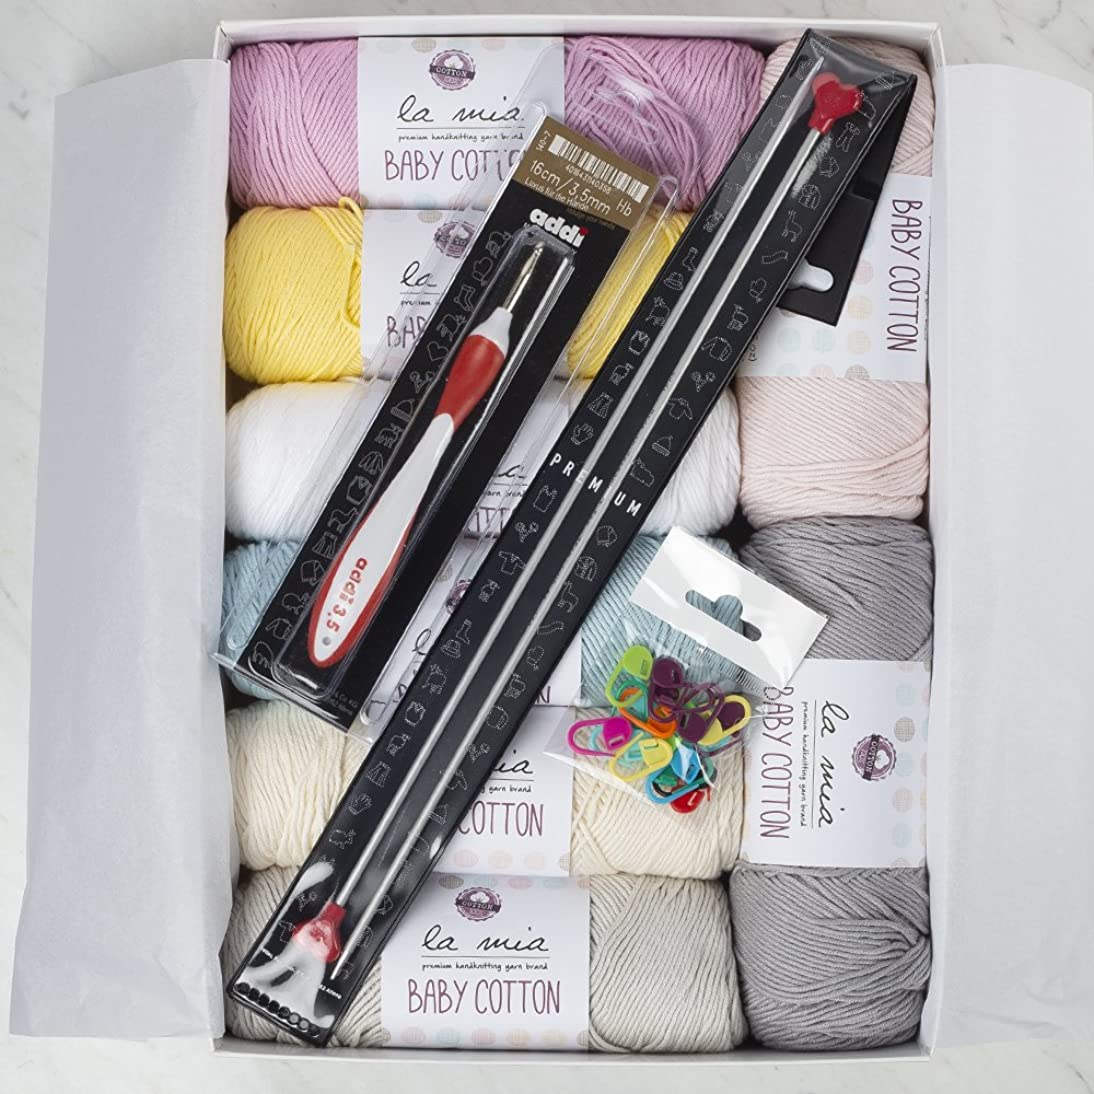 La Mia Baby Cotton Gift Set - Tulip, 8 Skeins of Assorted Colors La Mia Baby Cotton Yarn, 50% Cotton 50% Acrylic, 100 g (3.5 oz) / 200 m (218 yds), Yarn Weight: 4 : Worsted-Aran - Tulip